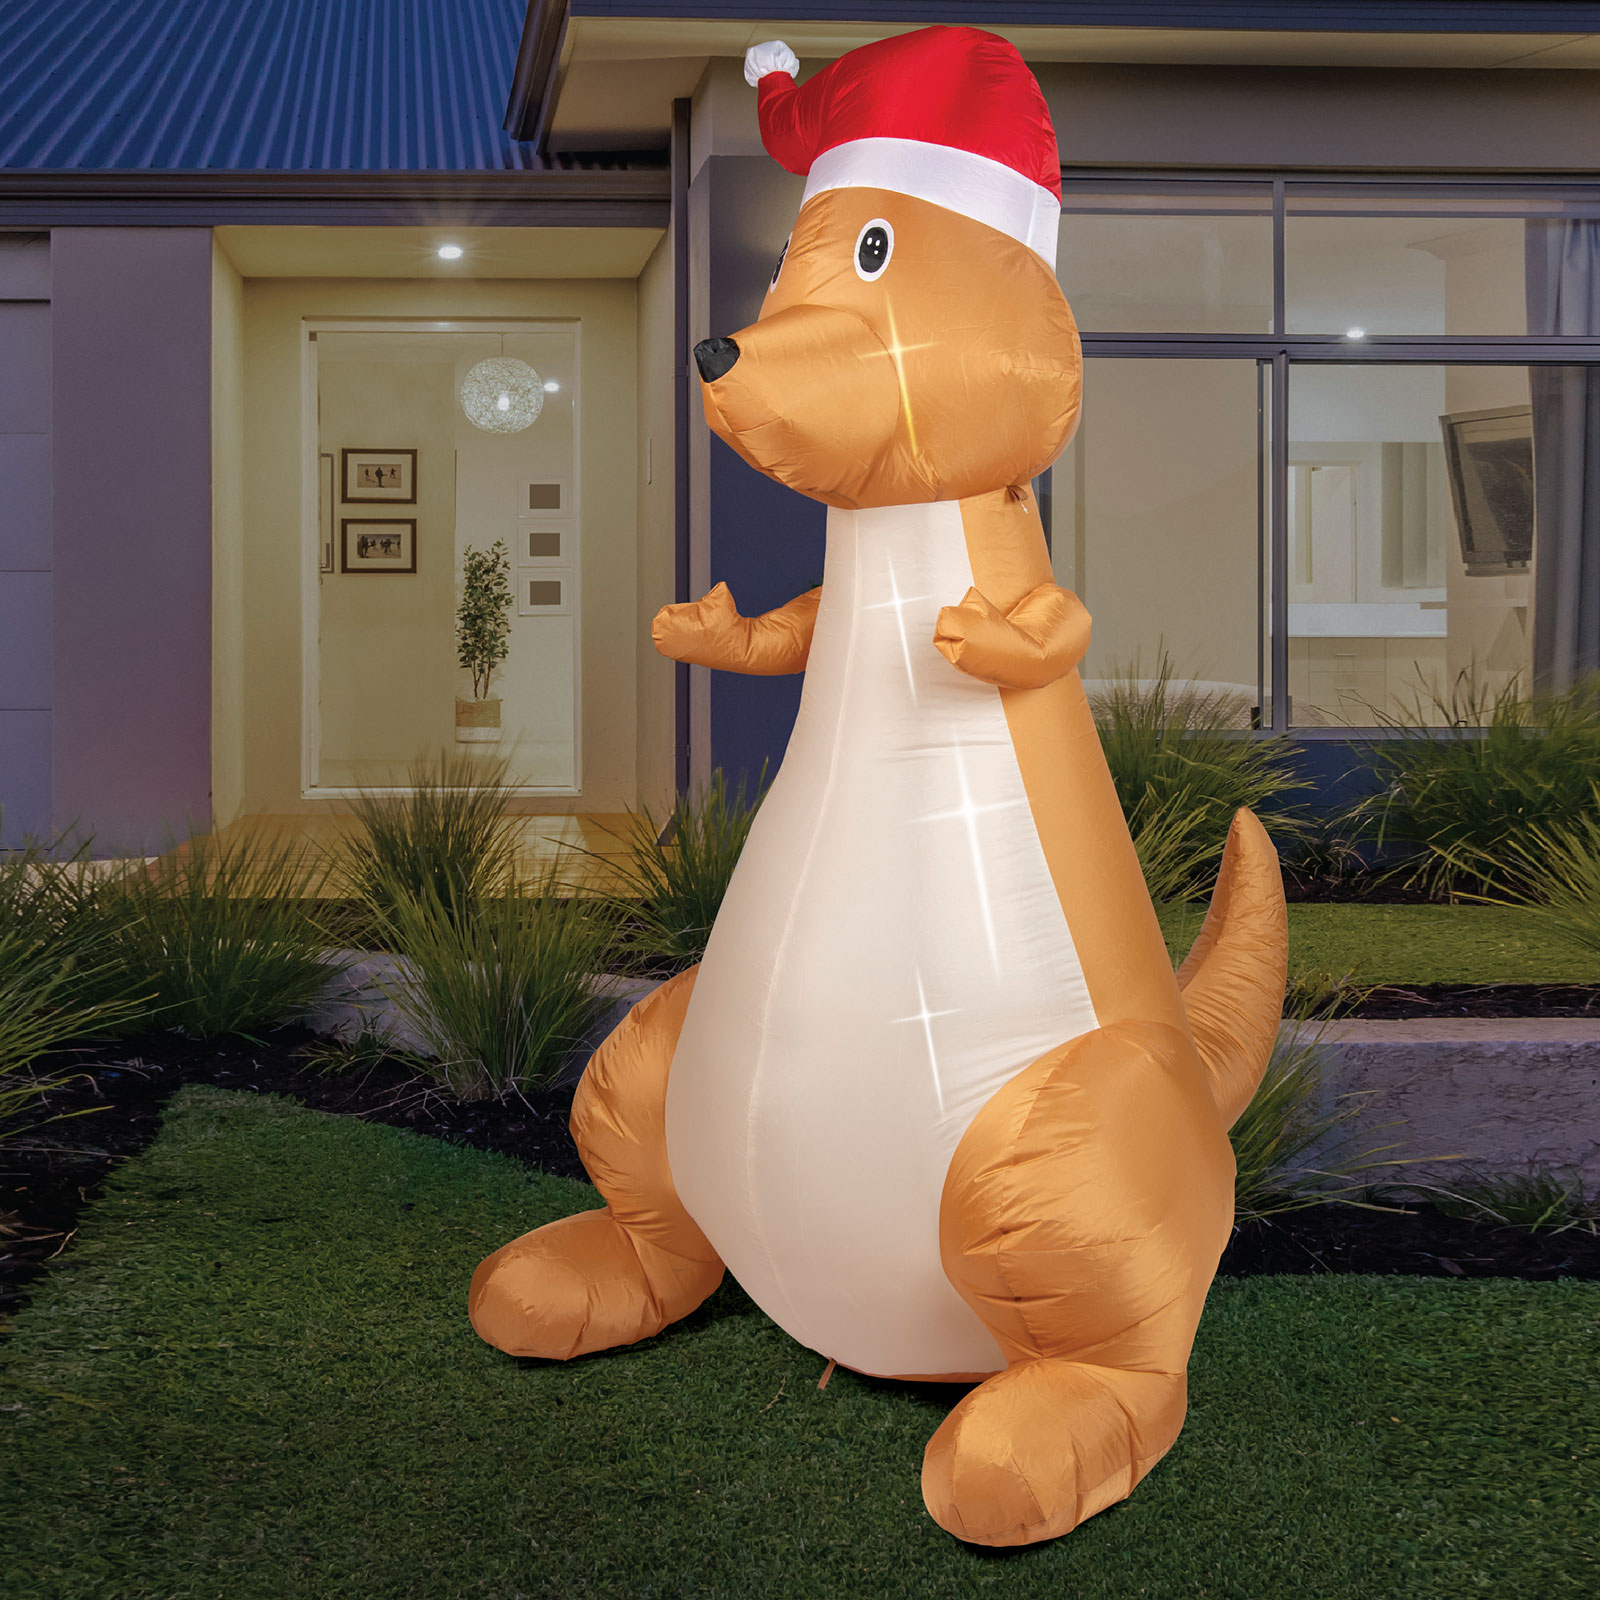 AIRPOWER CHRISTMAS Kangaroo Inflatable Outdoor Decor Lights Up 1.8m Outdoor